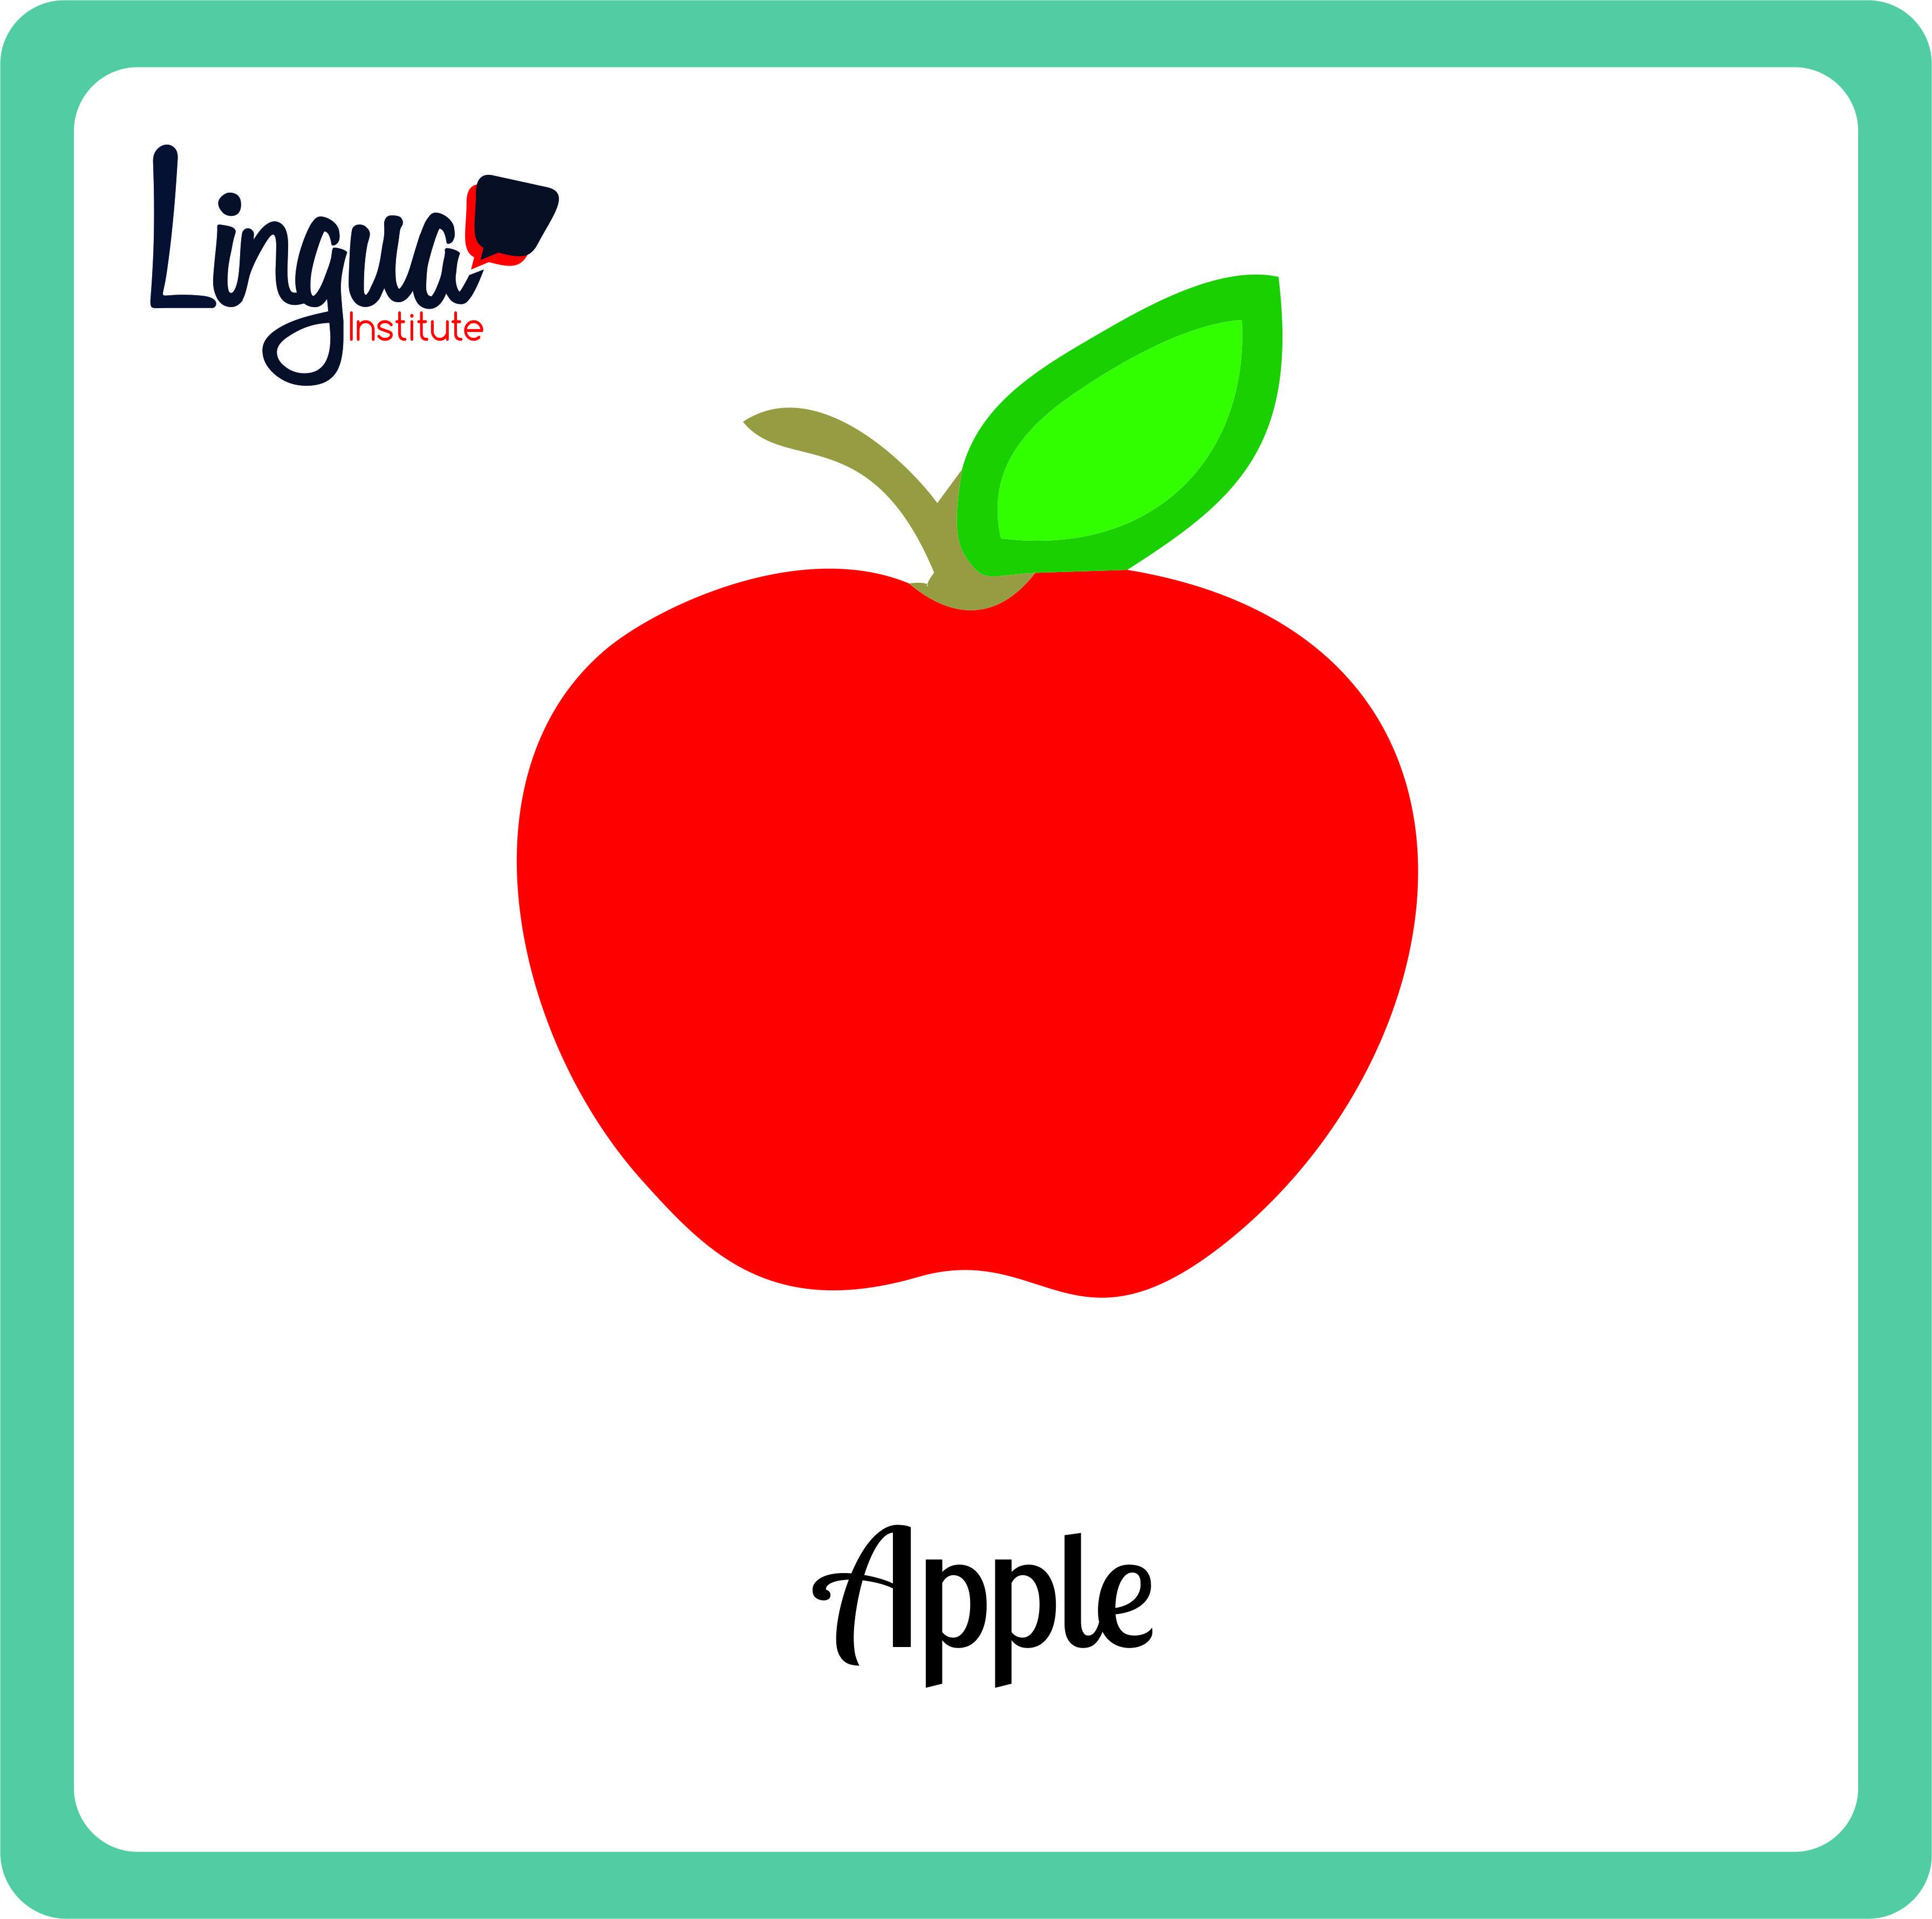 Manzana Apple Frutas En Ingles Fruits In English Lingua Institute Manzana En Ingles Aprender Italiano Aprender Frances